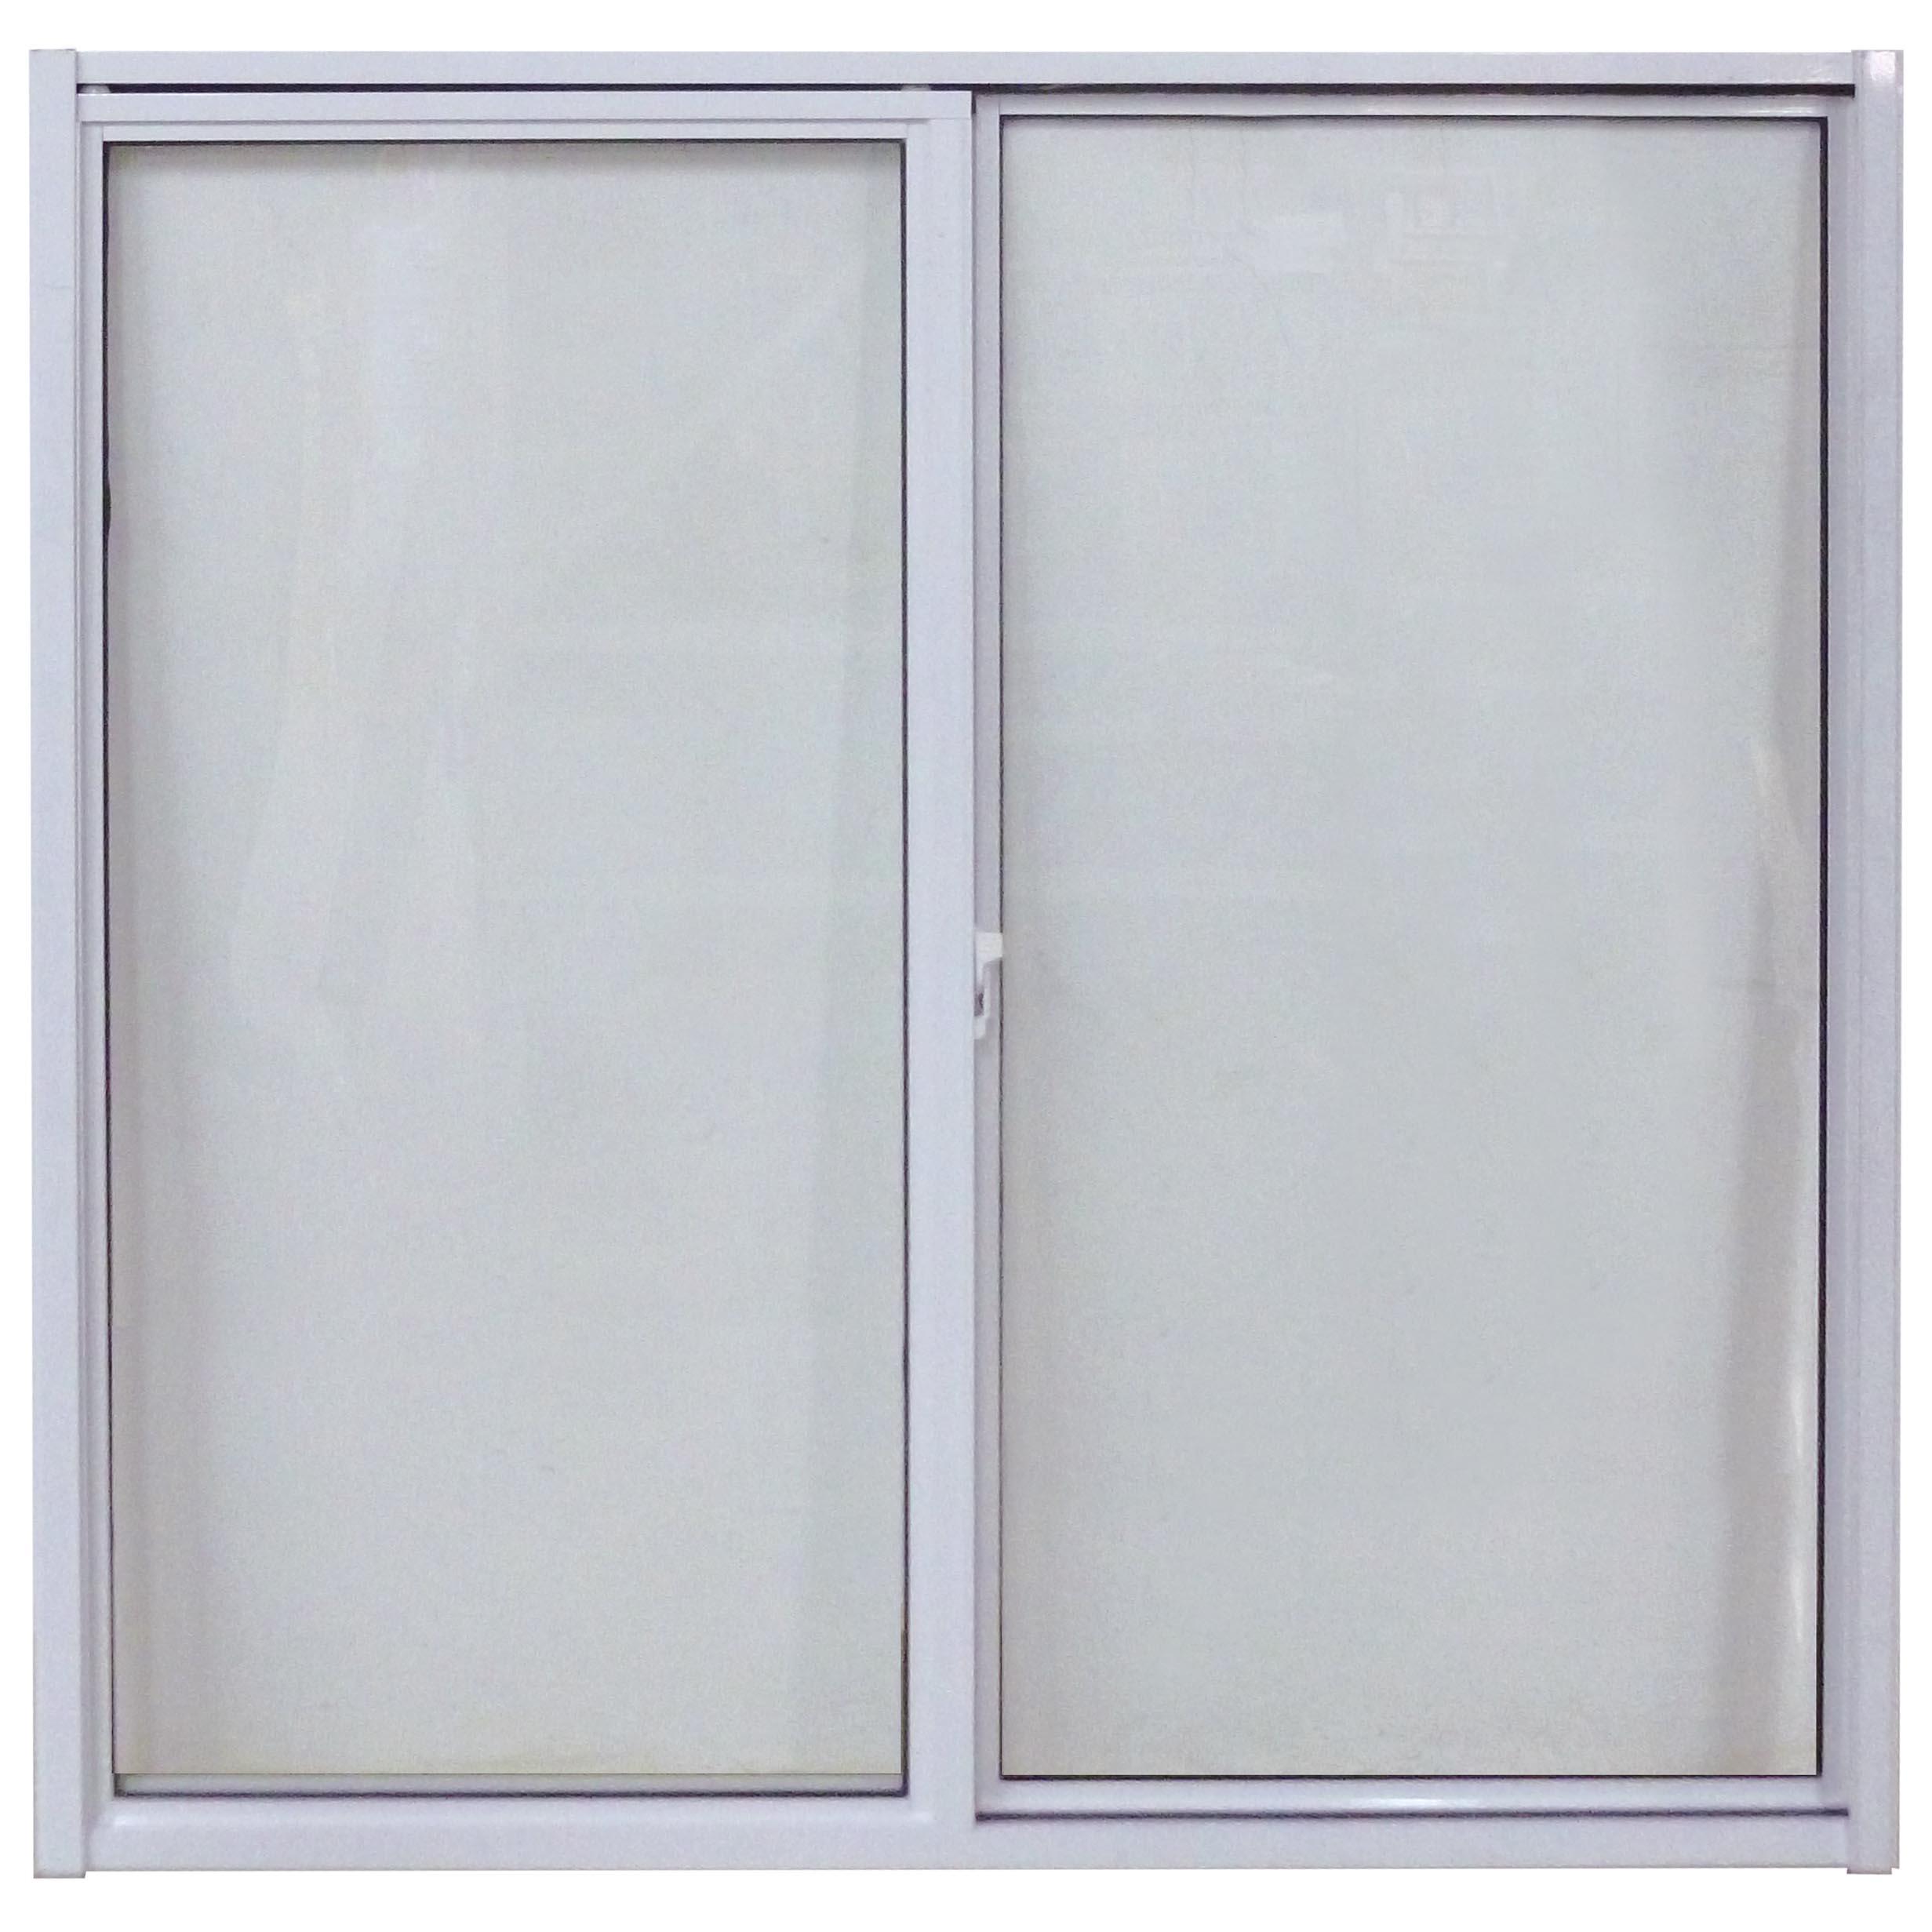 Ventana sencilla de 1.5m x 1.2m corrediza de aluminio color blanco